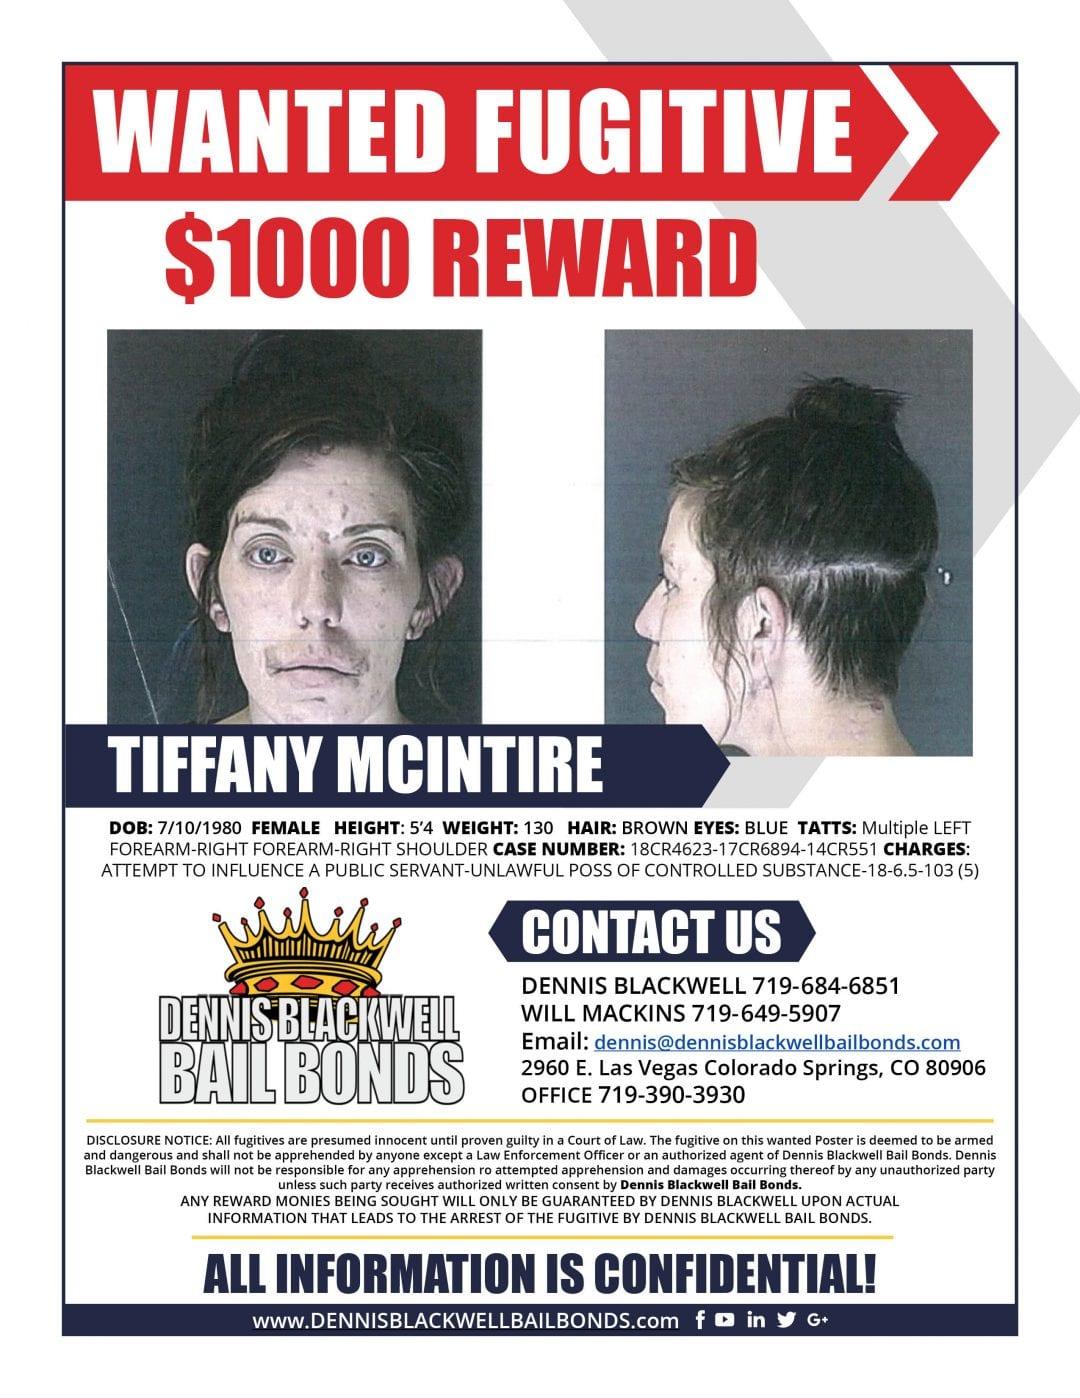 TIFFANY MCINTIRE